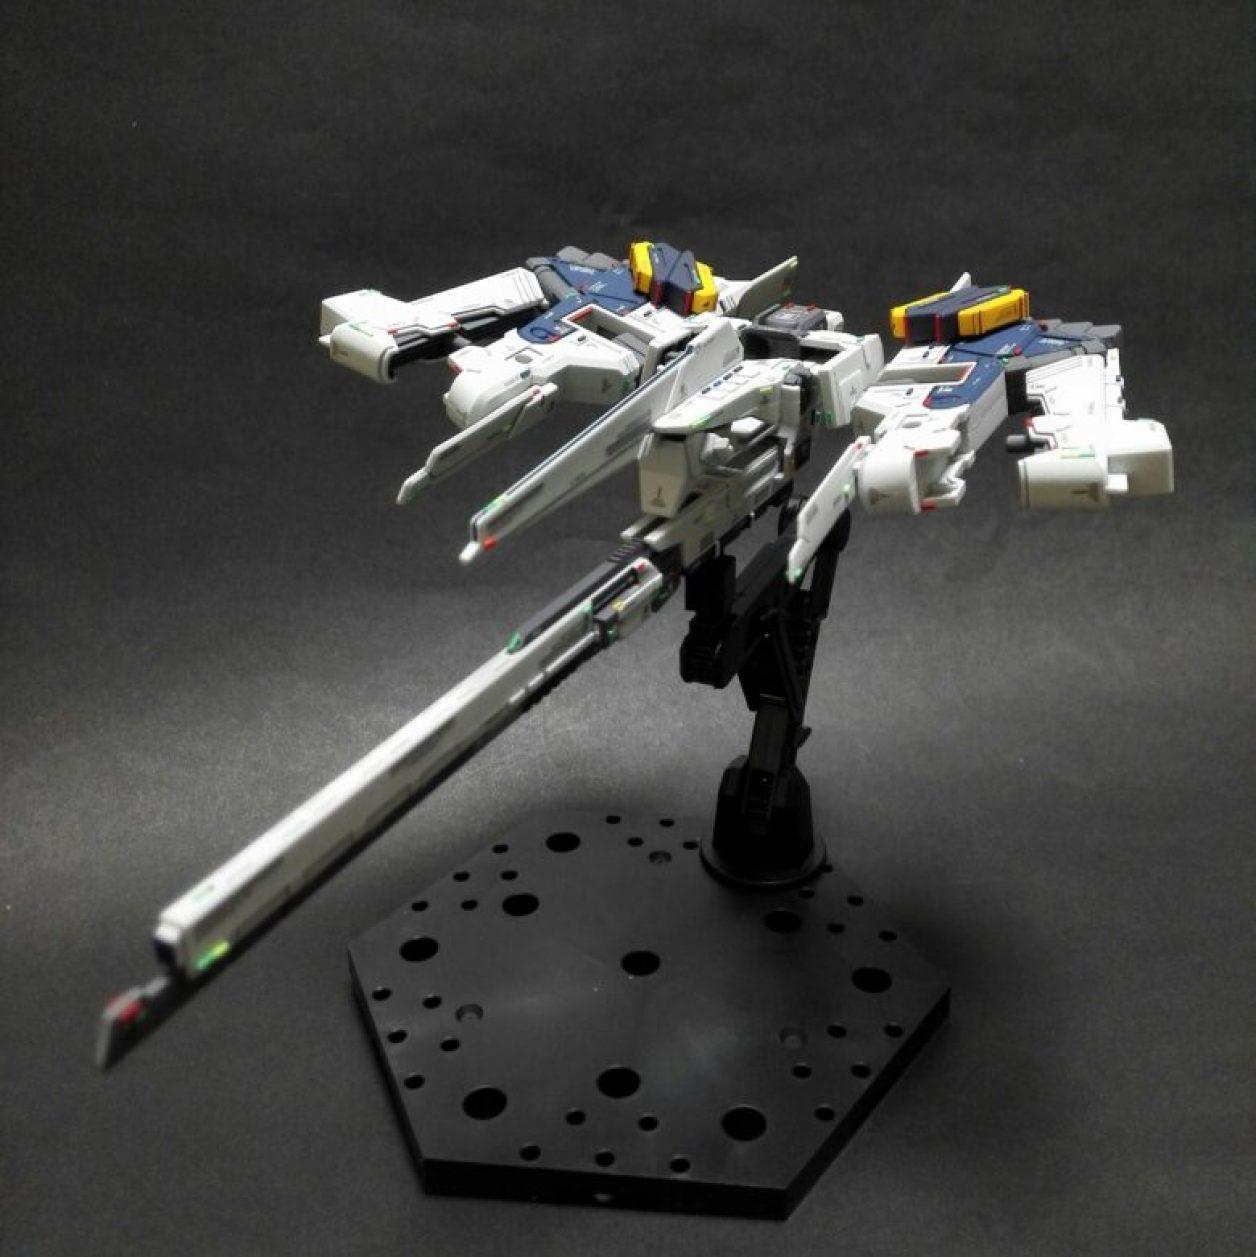 FG版 Gパーツ[フルドド]のクロウ・ウィング・ユニット×2のGベース形態にエネルギー・パックを保持させた画像